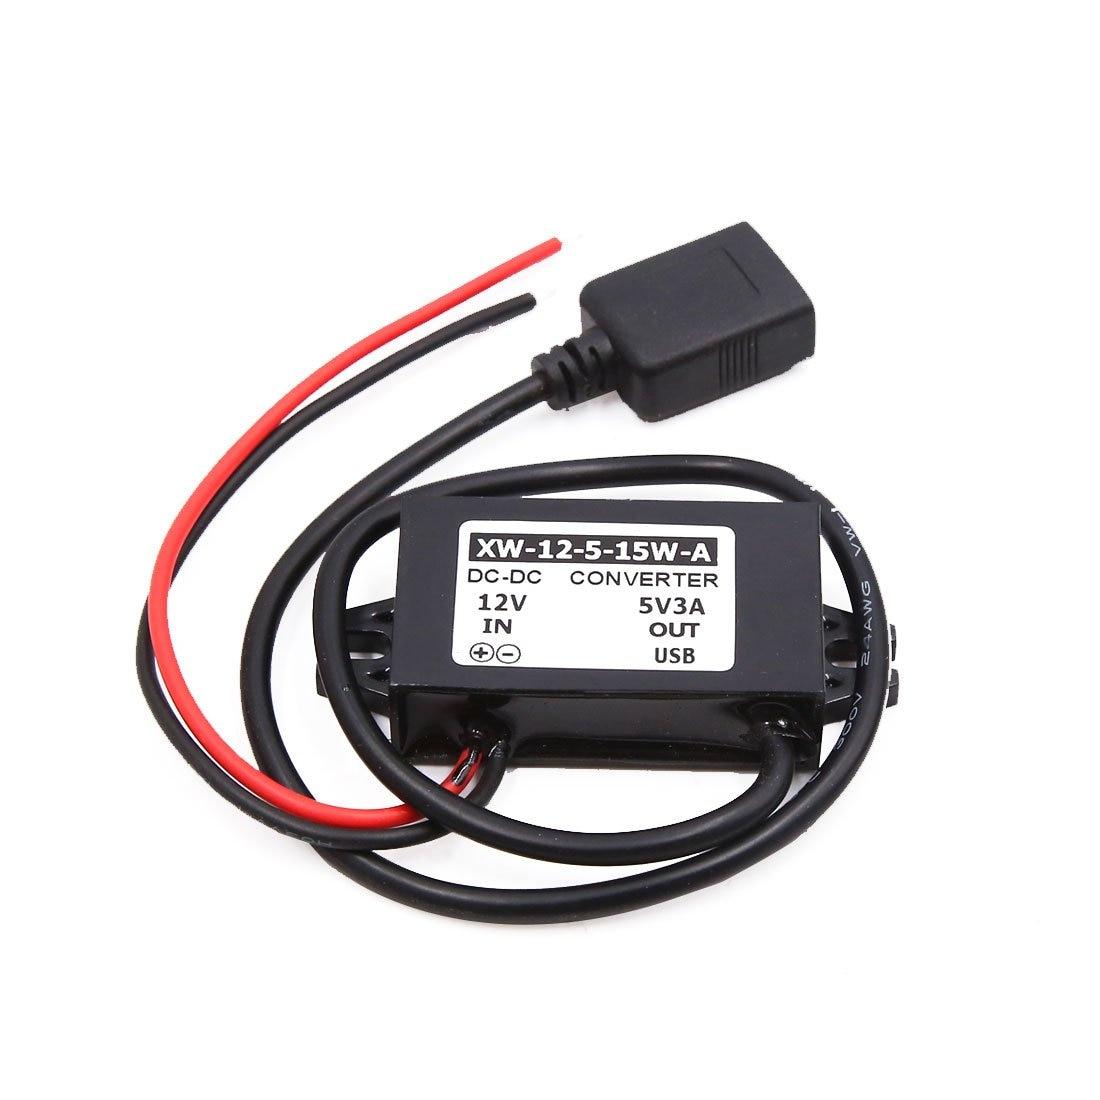 uxcell 12V to 5V 3A USB Car Step Down Reducer Power Supply Transformer Converter|Car Inverters| |  - title=